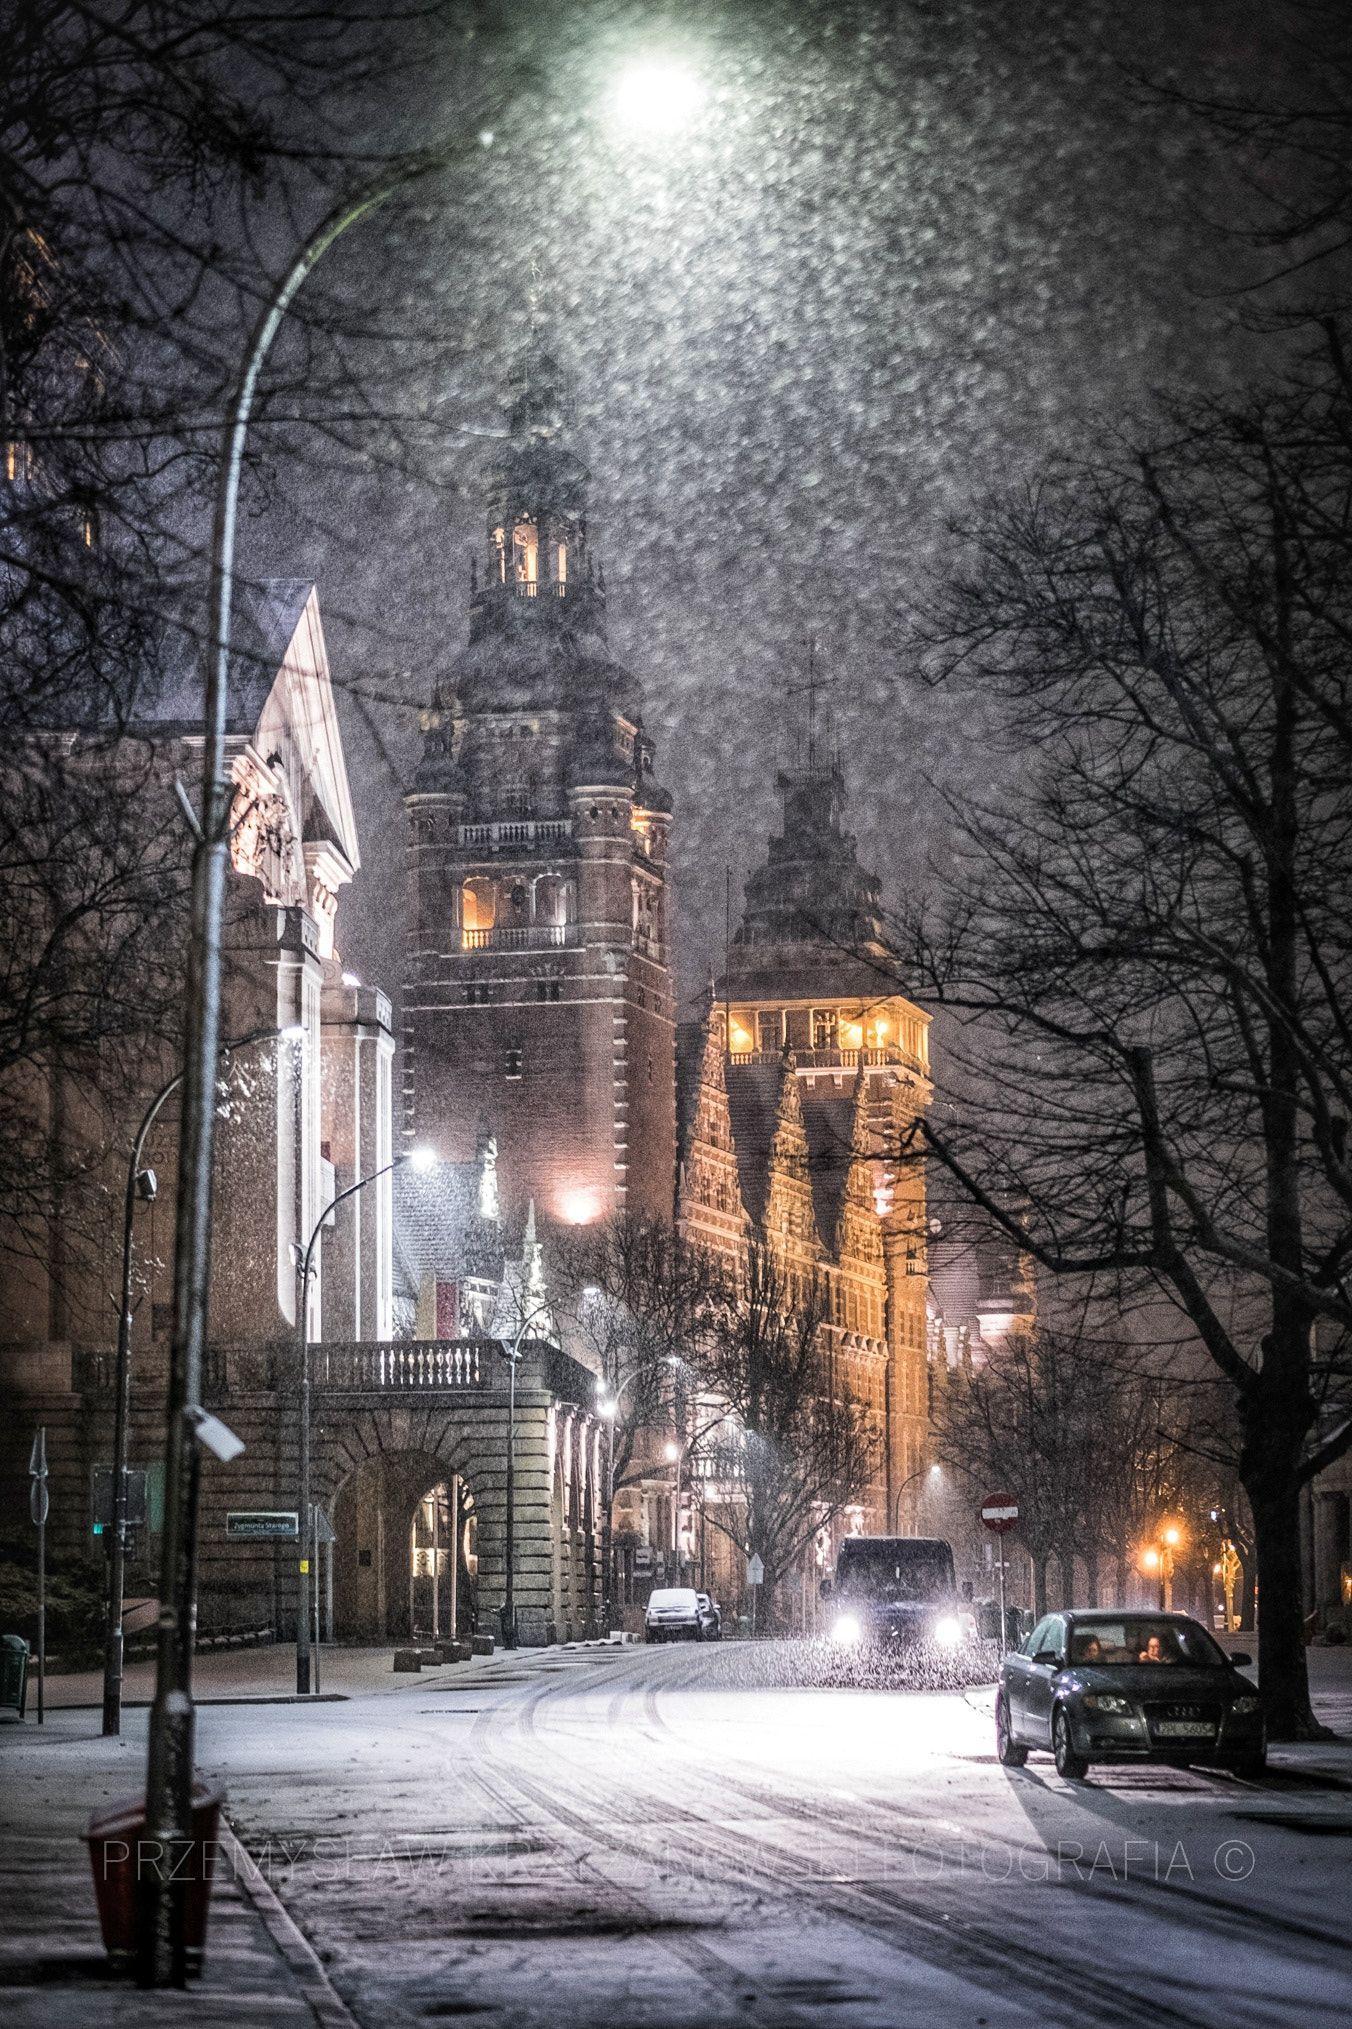 First Snow Winter Scenery Winter Scenes Szczecin